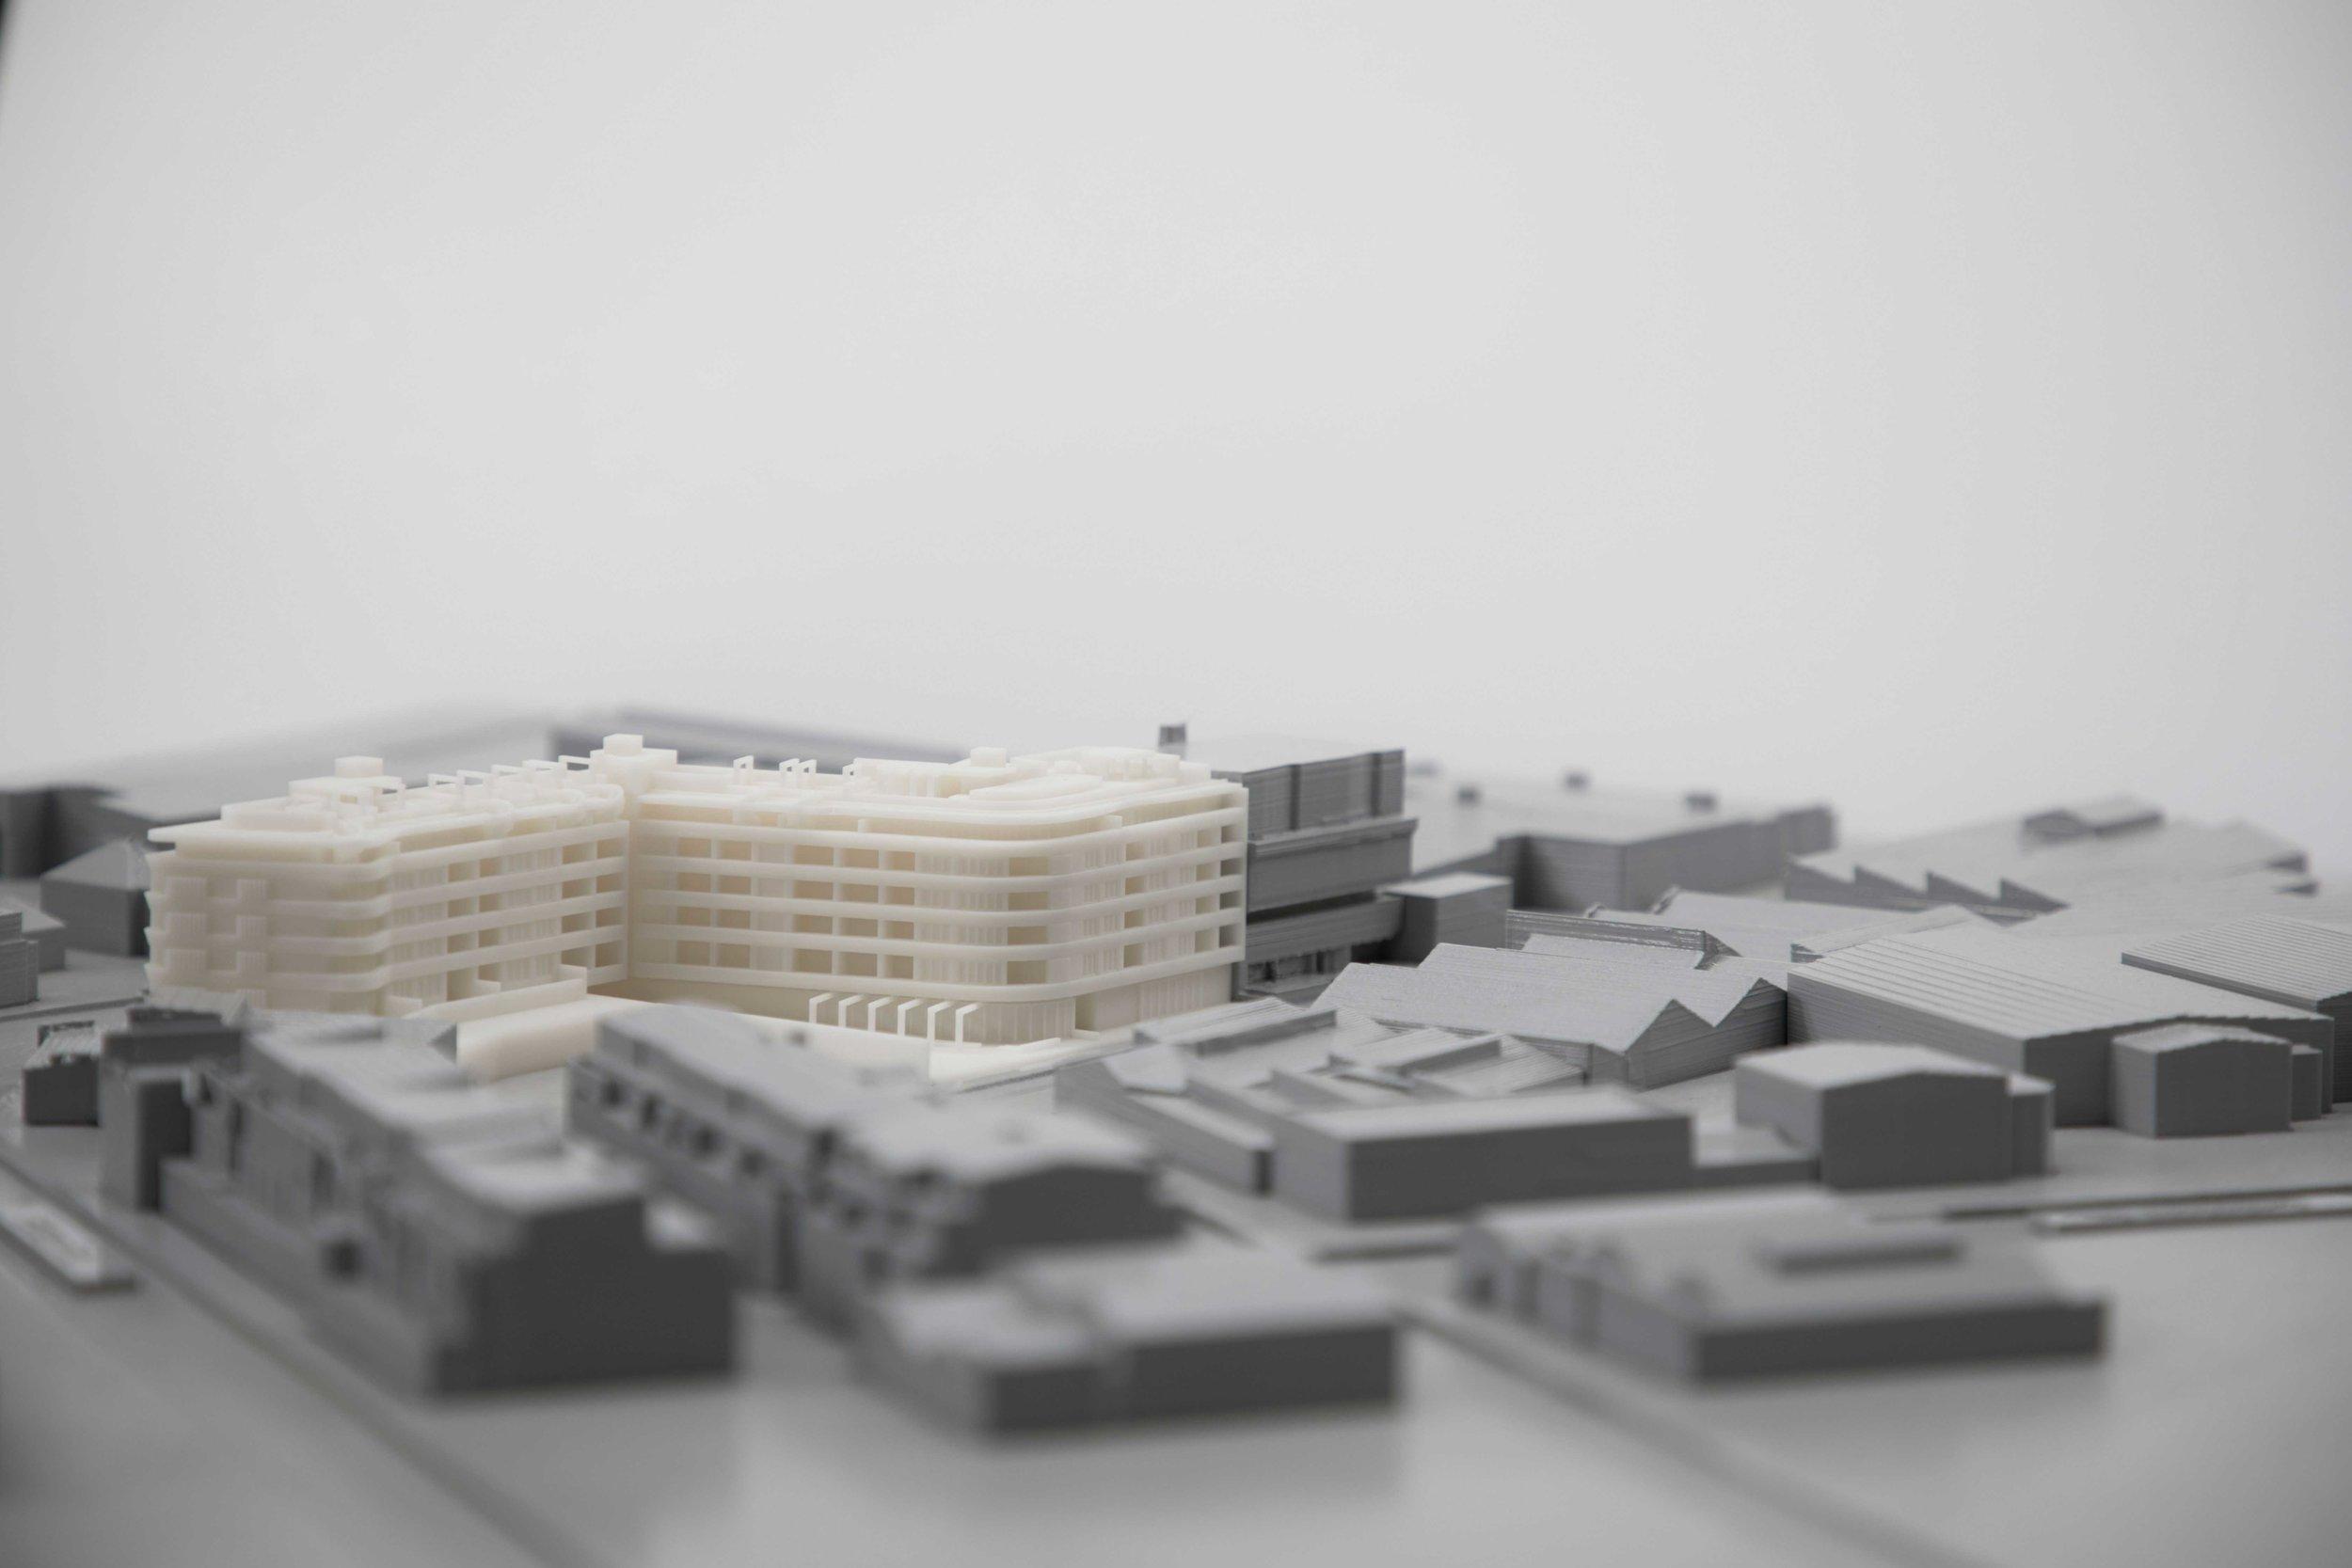 Make_models_da_Sydney_architecture_model.jpg